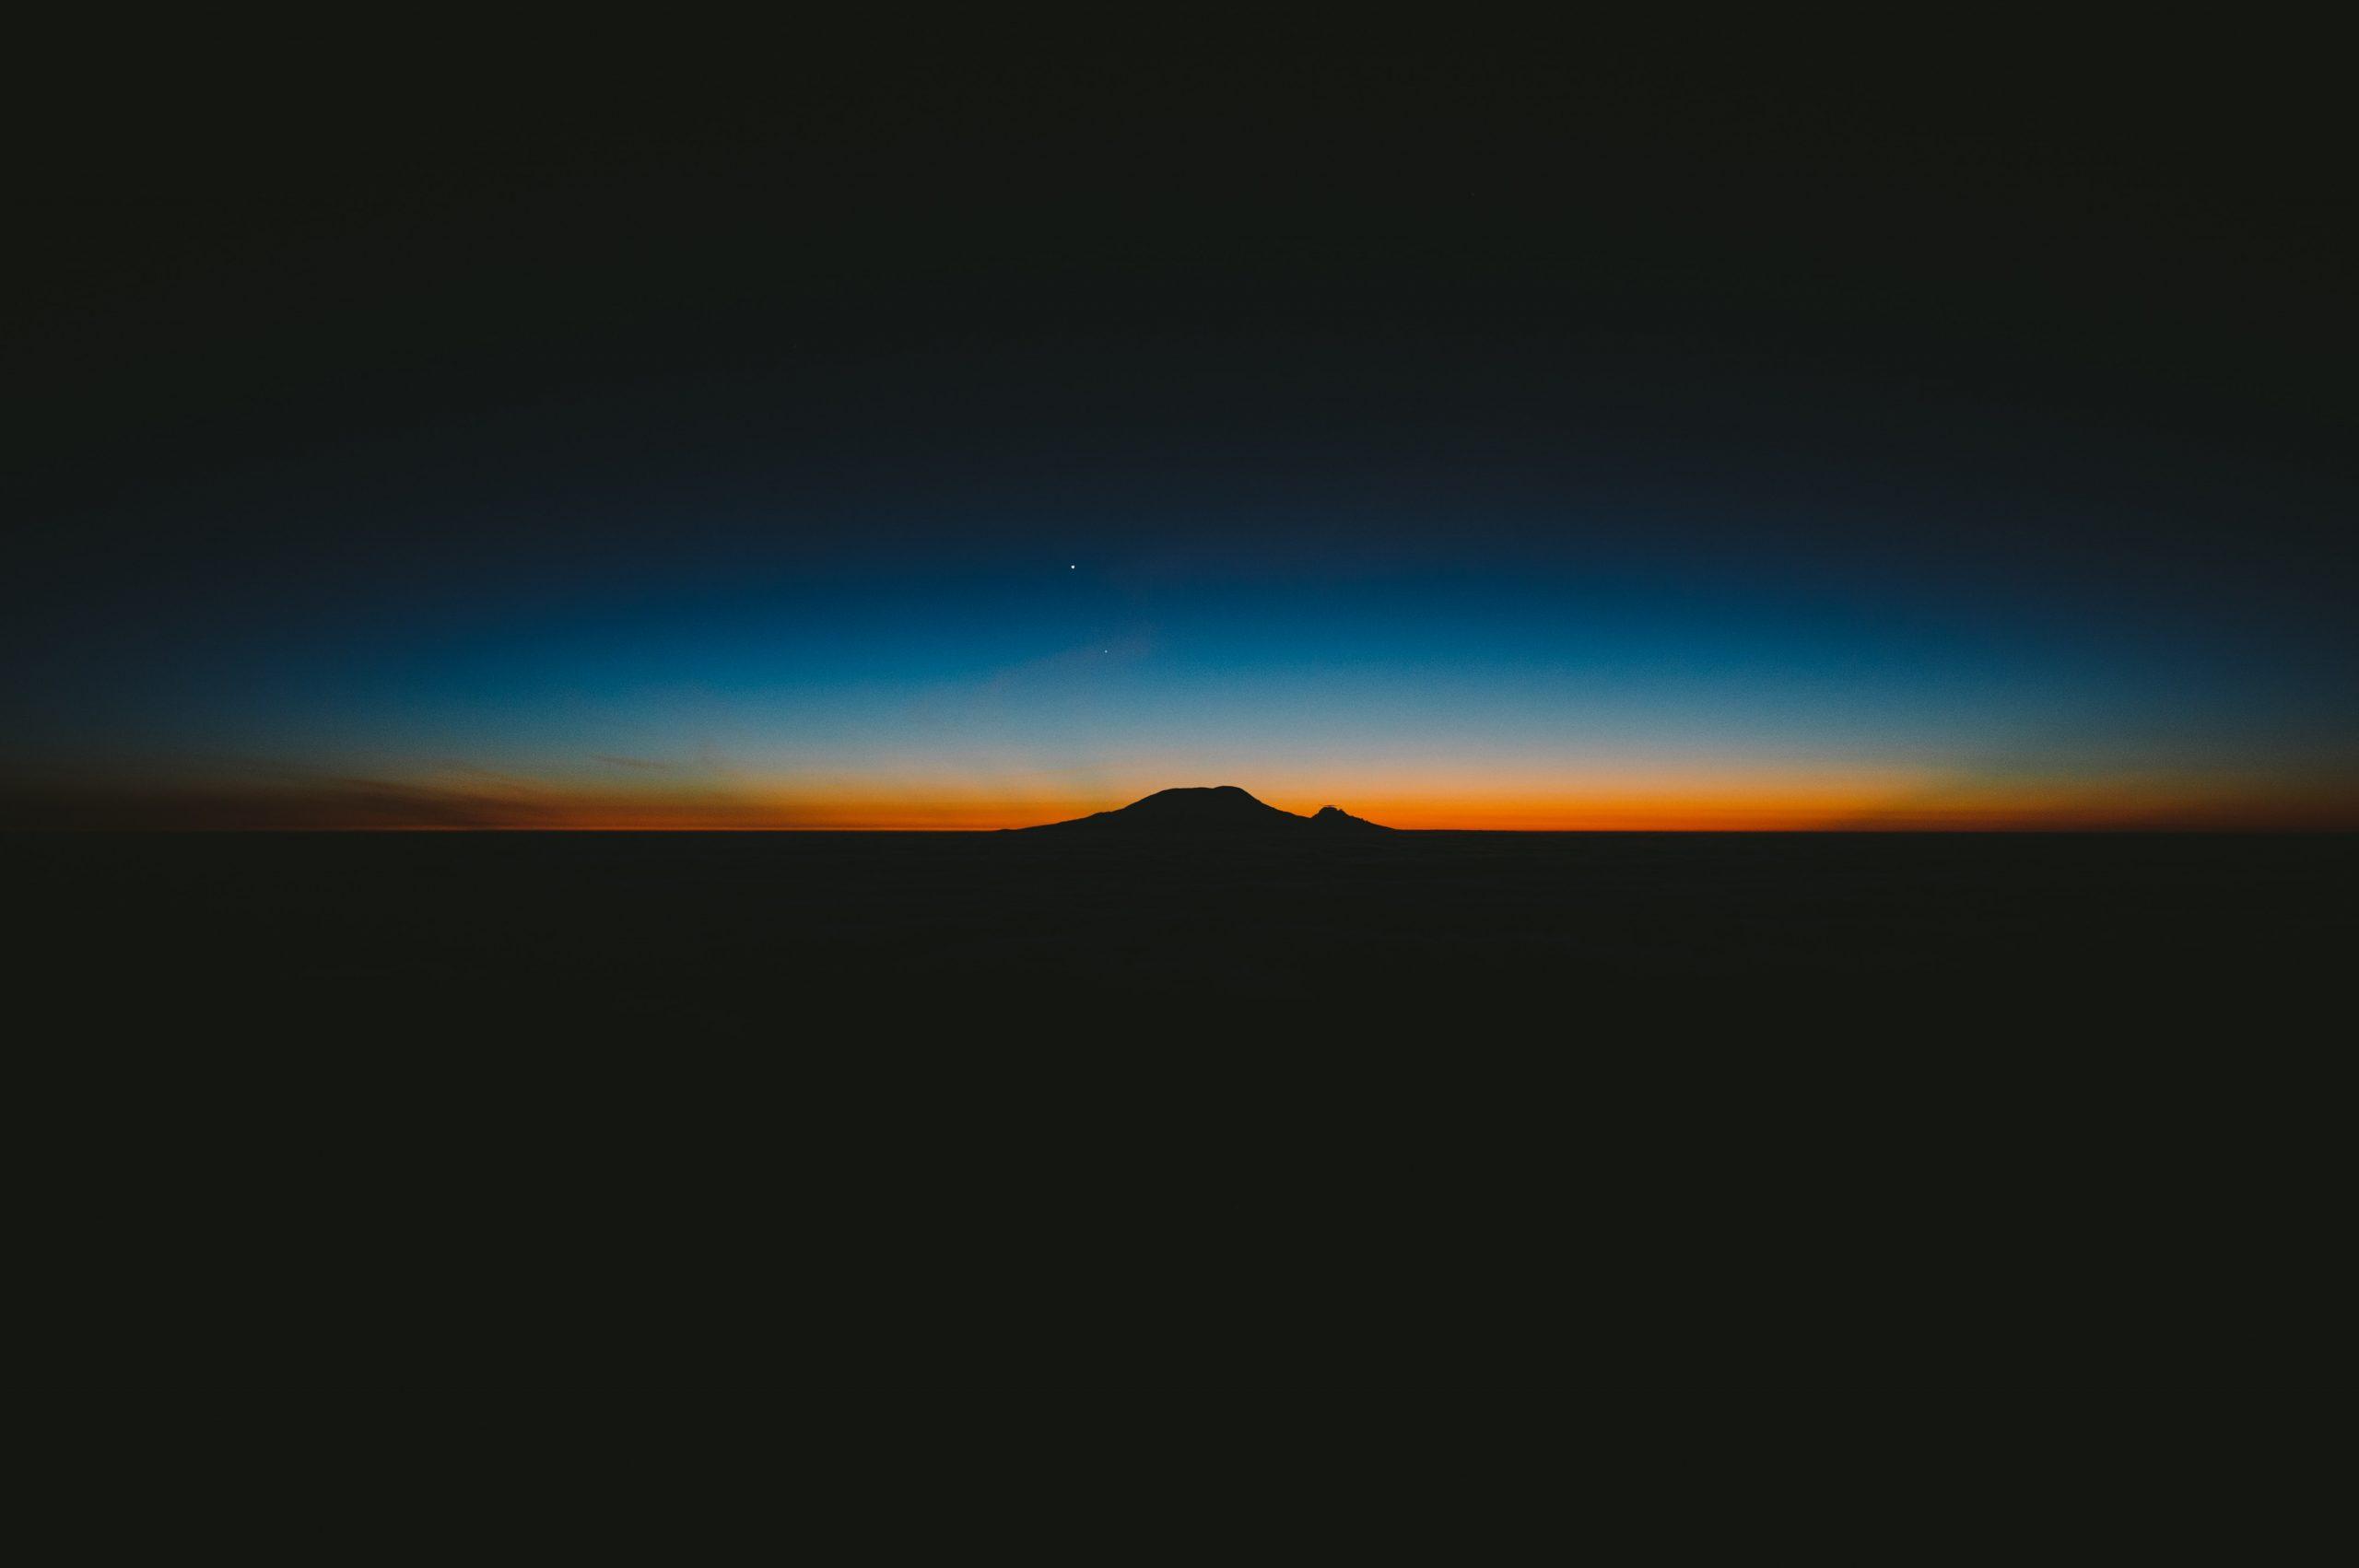 wallpaper Silhouette of mountain